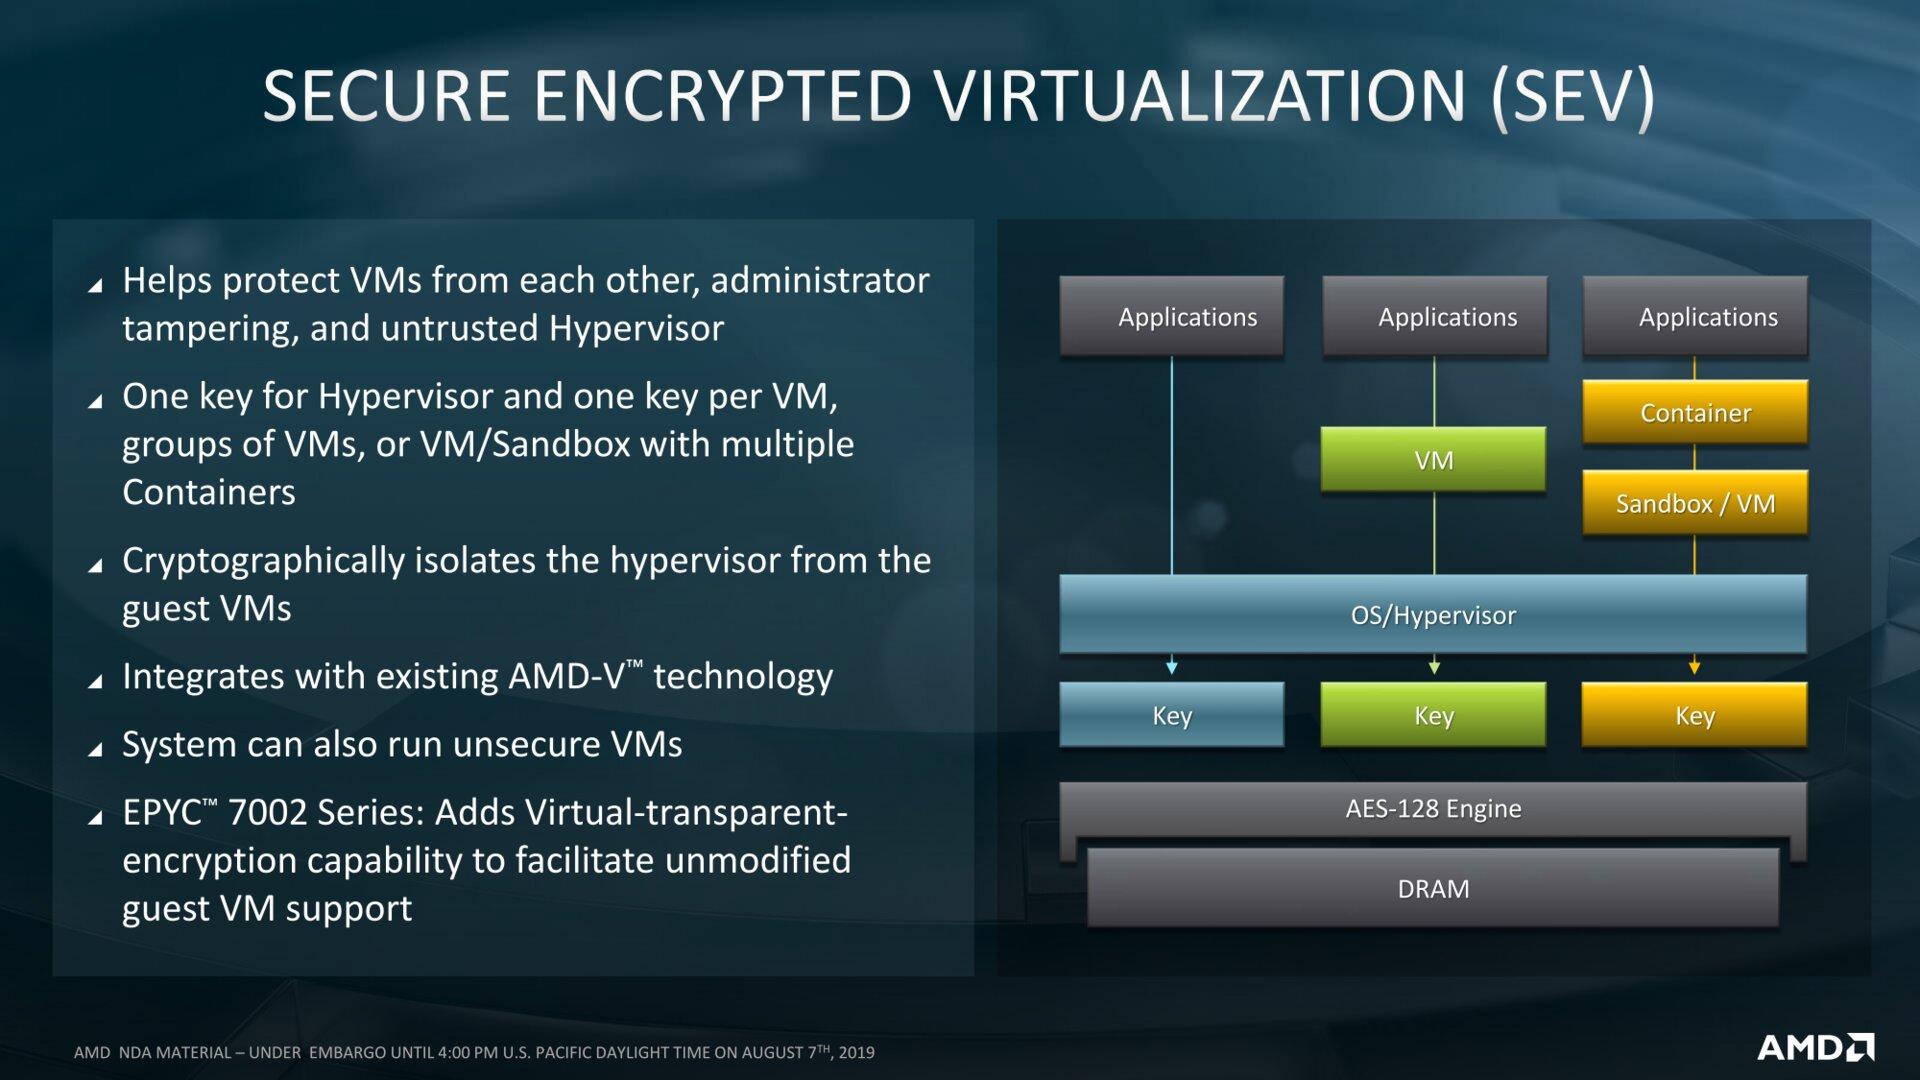 Secure Encrypted Virtualization